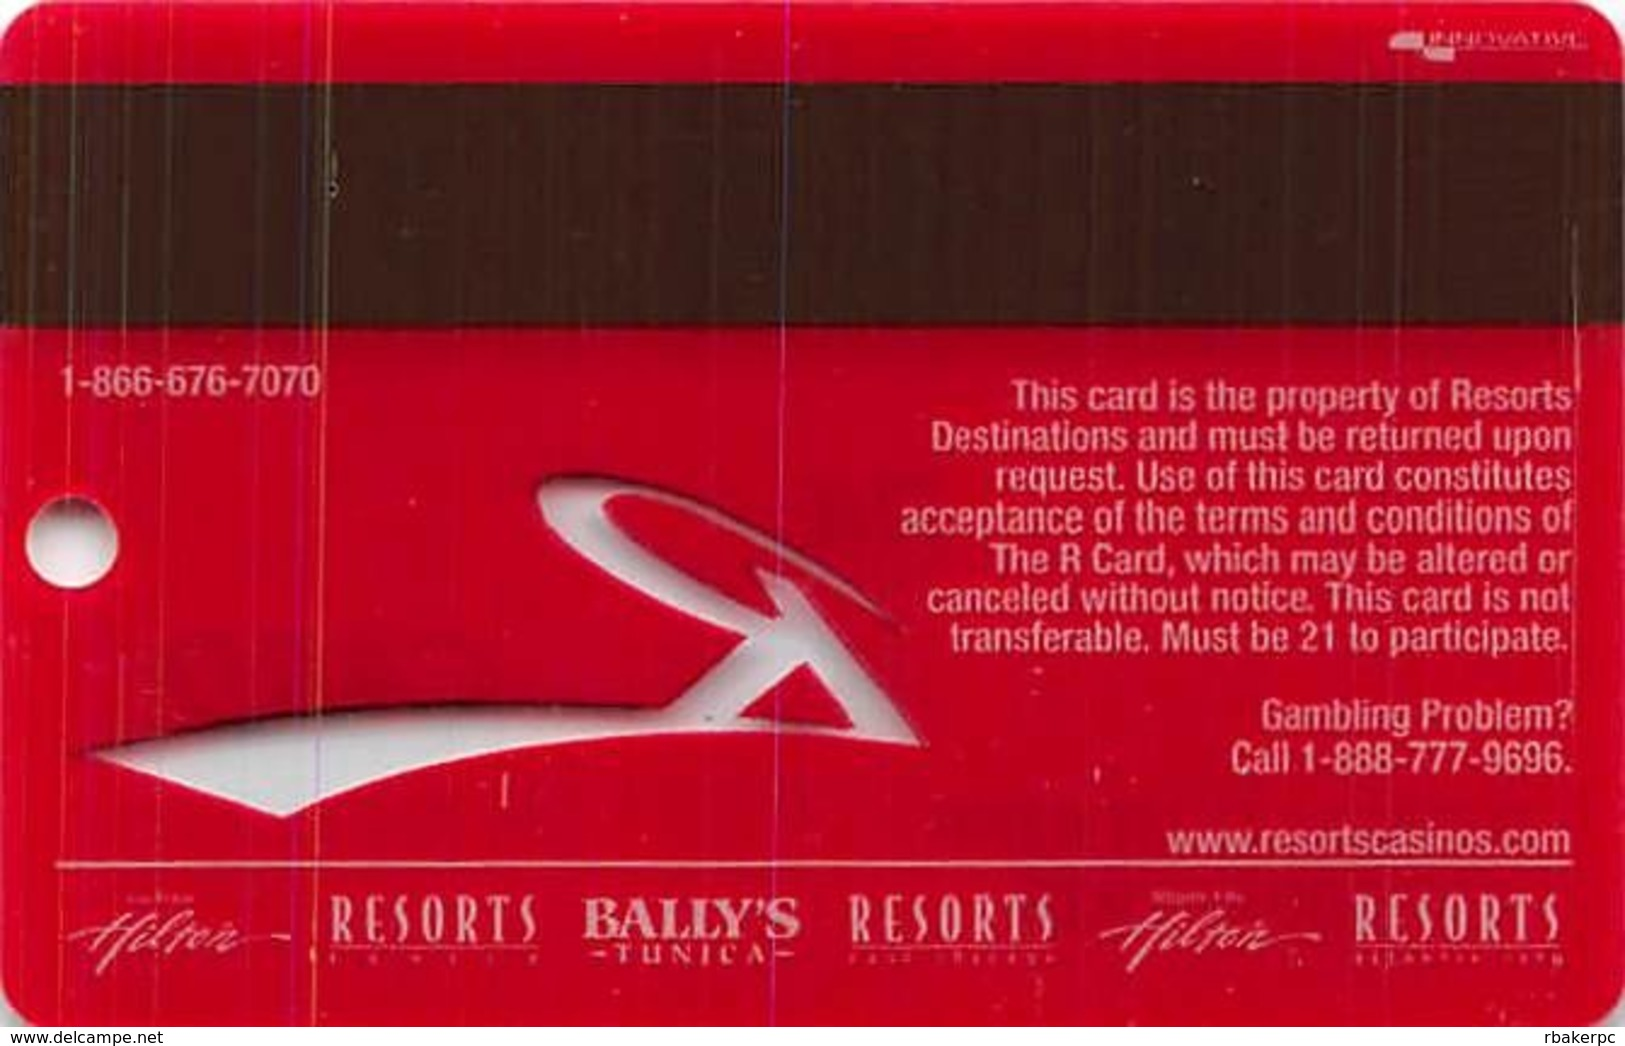 Resorts Casino - Tunica, MS - BLANK Slot Card - Clear 'R' - Shadow On Insert Arrow - Casino Cards